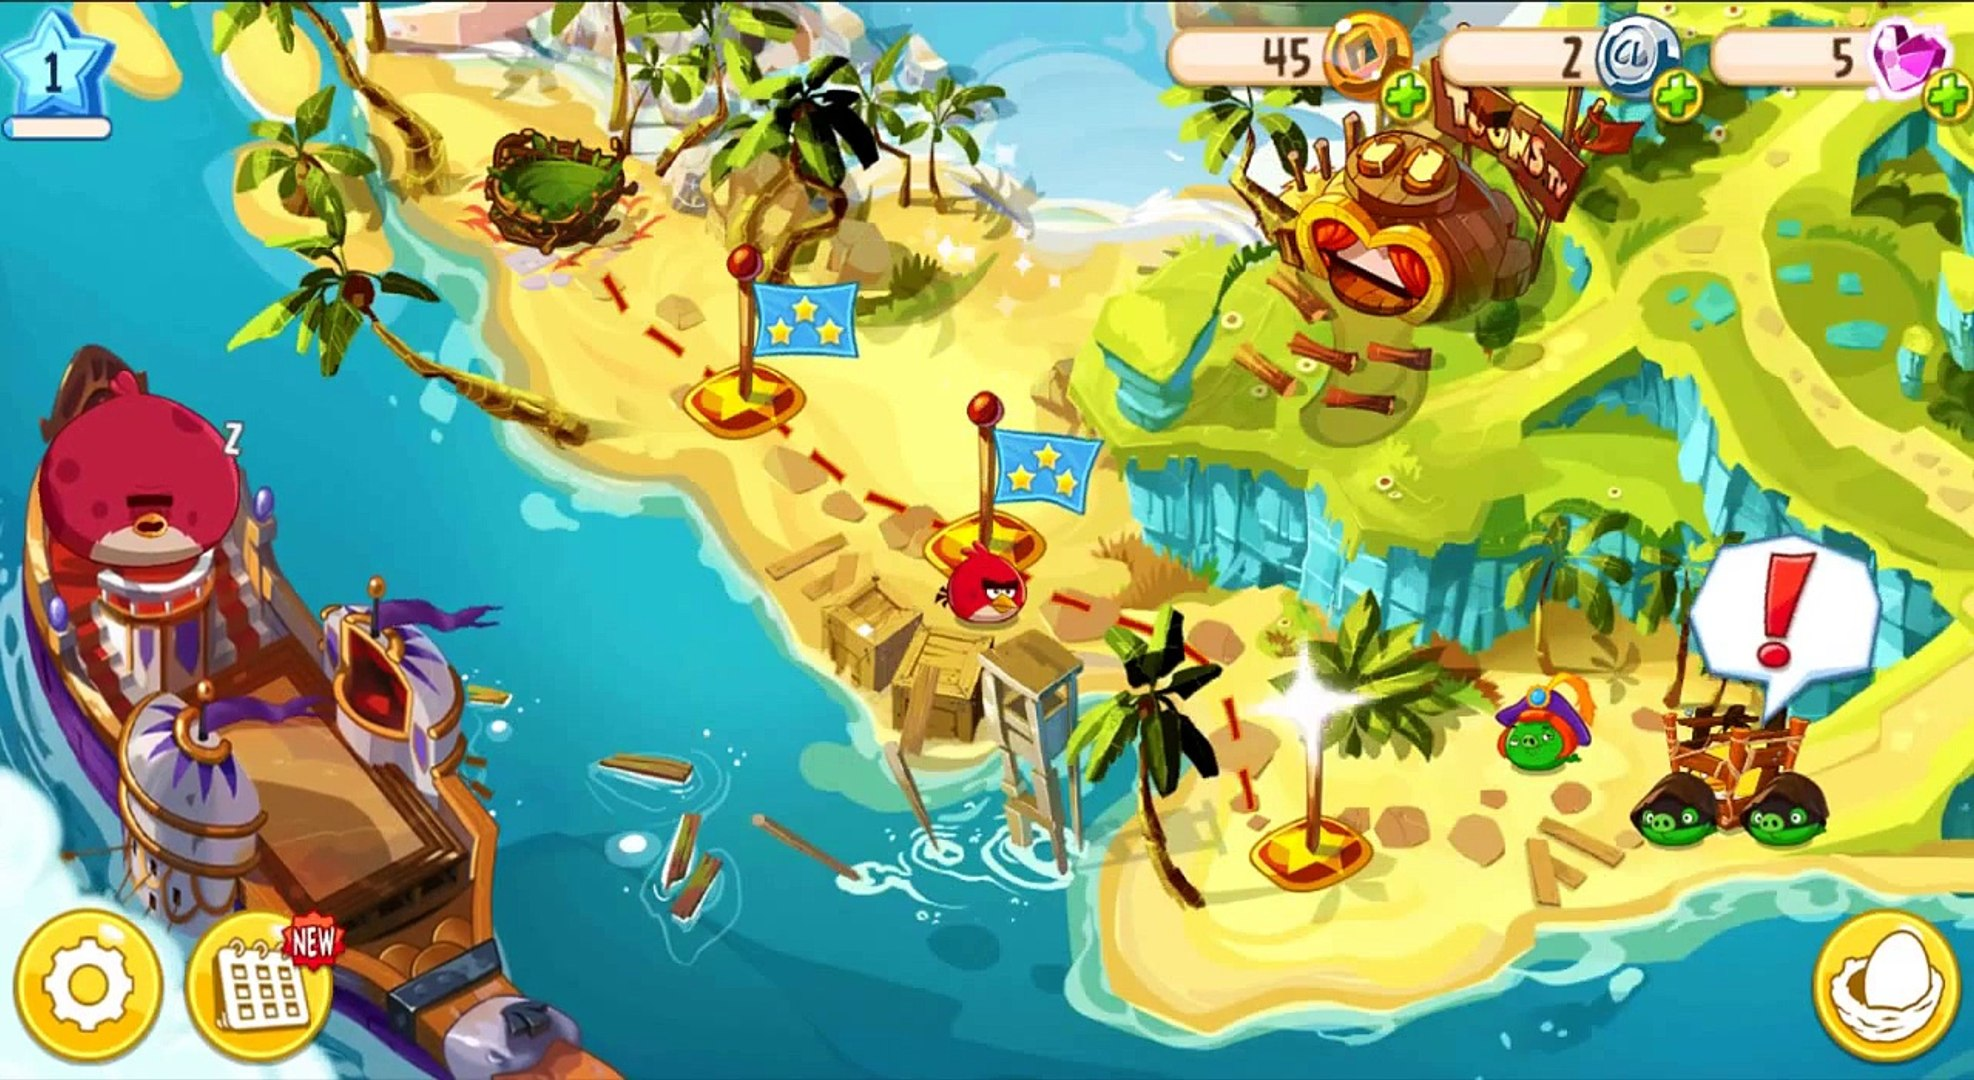 Best Mobile Kids Games - Angry Birds Epic Rpg - Rovio Entertainment Ltd